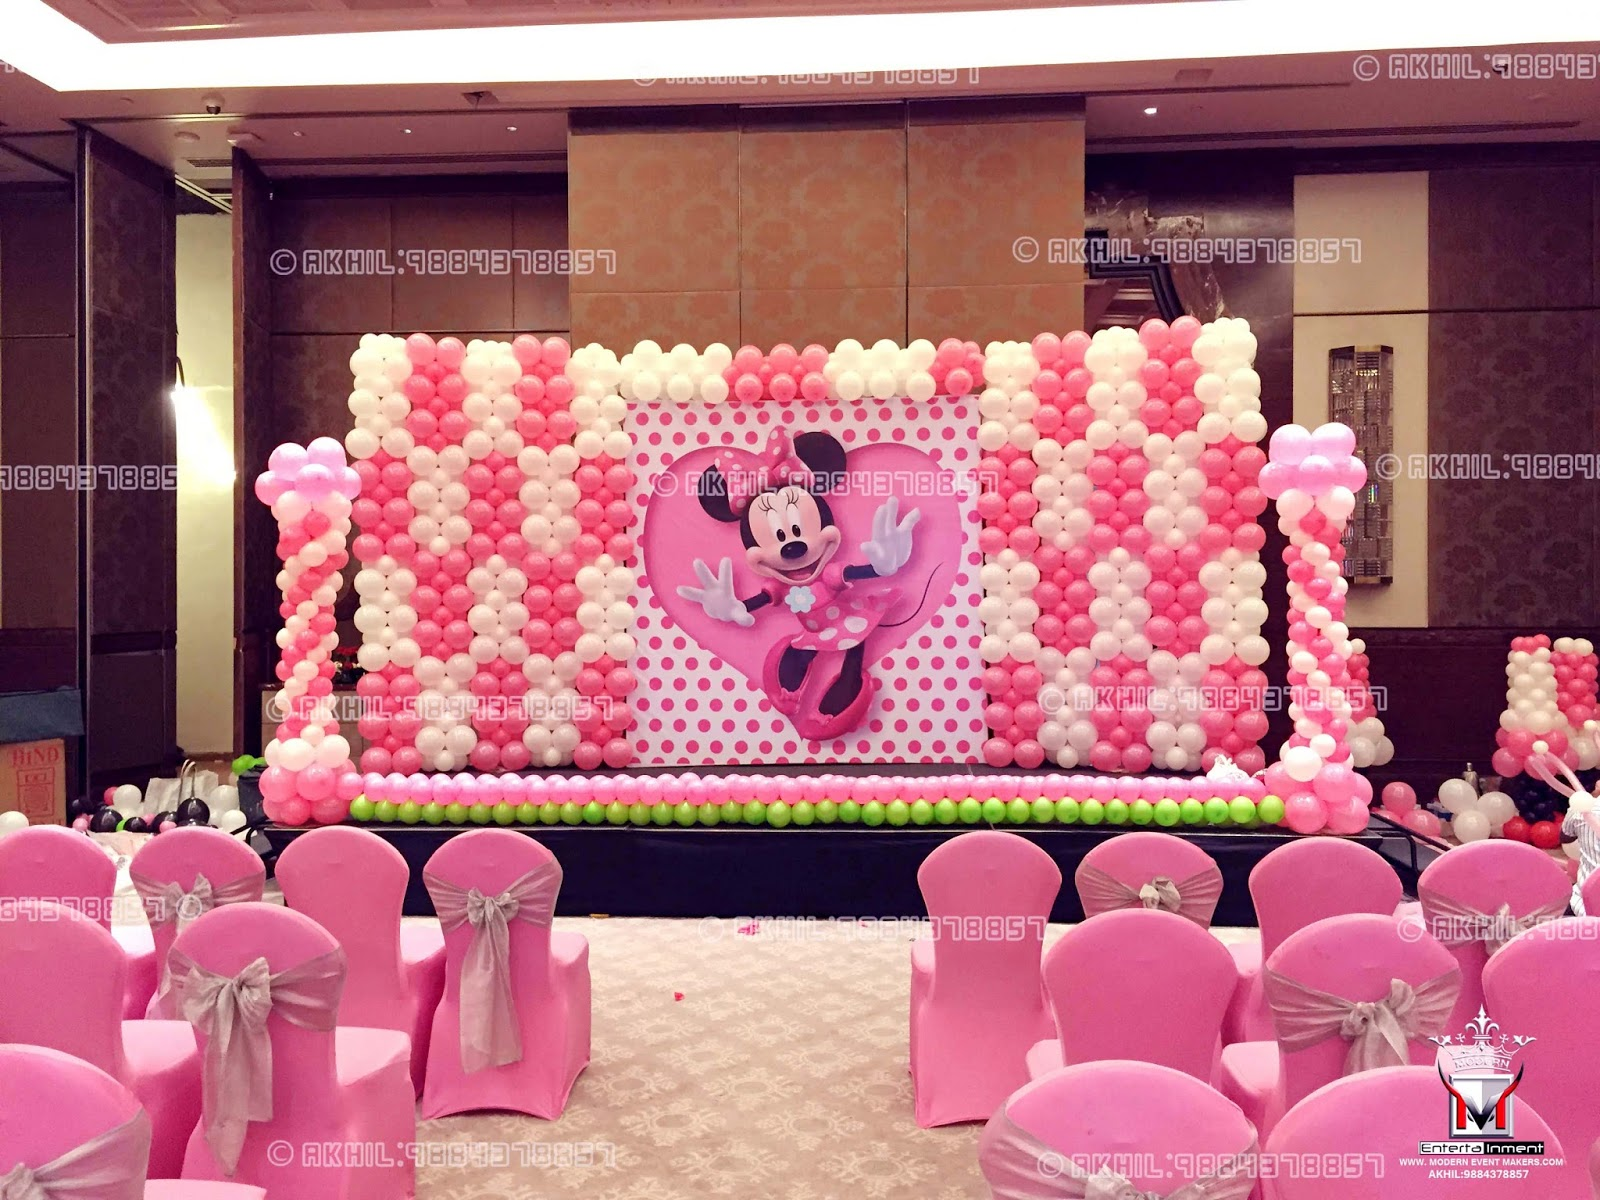 Event Management Company Balloon Decoration Modern Entertainment